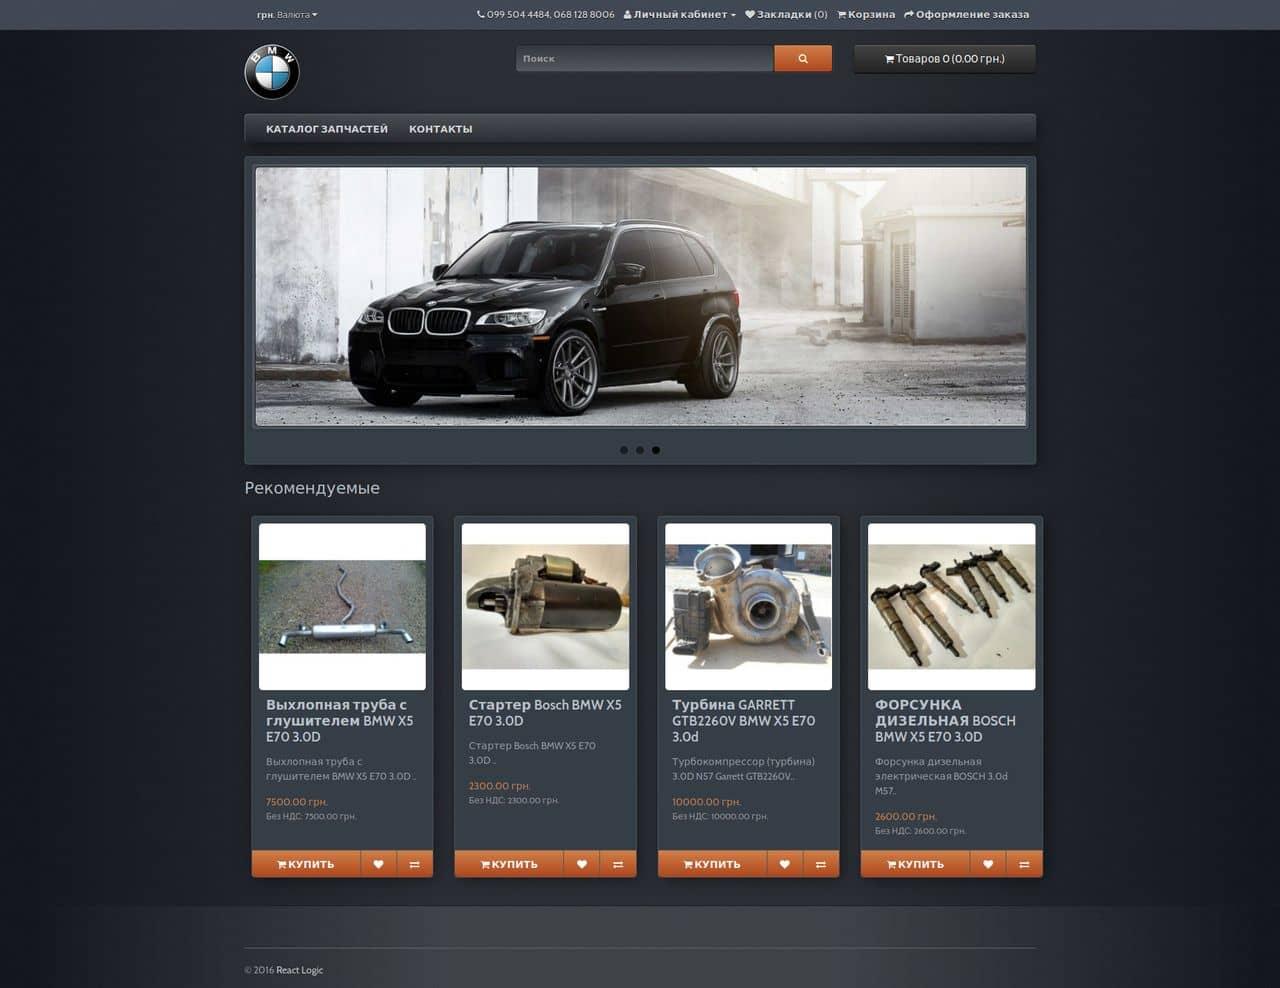 Онлайн магазин автозапчастей